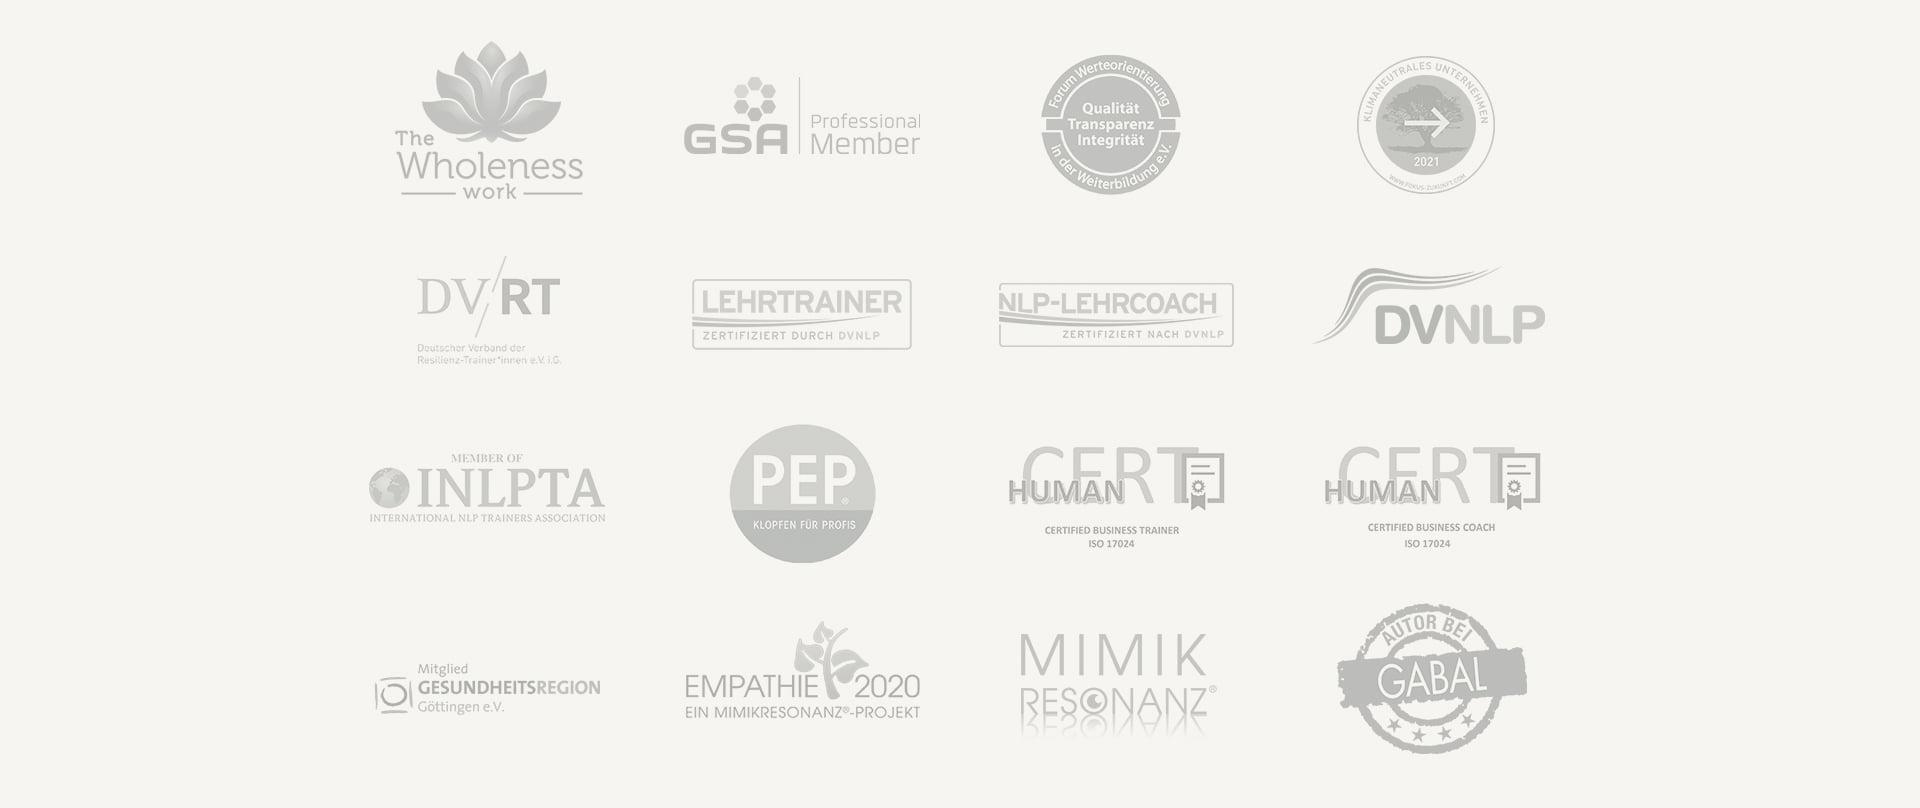 resilienz-akademie-partner-logos2